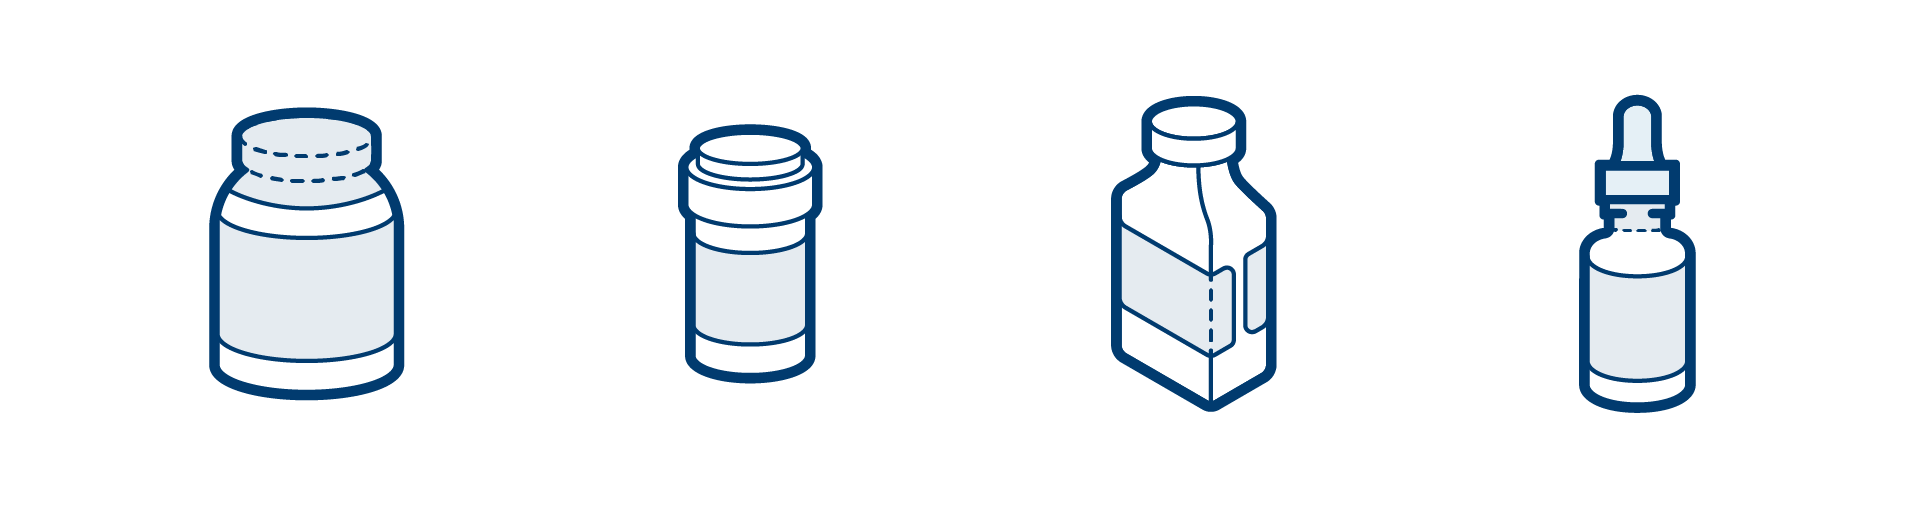 Content_PharmaceuticalBottleLabelTypes